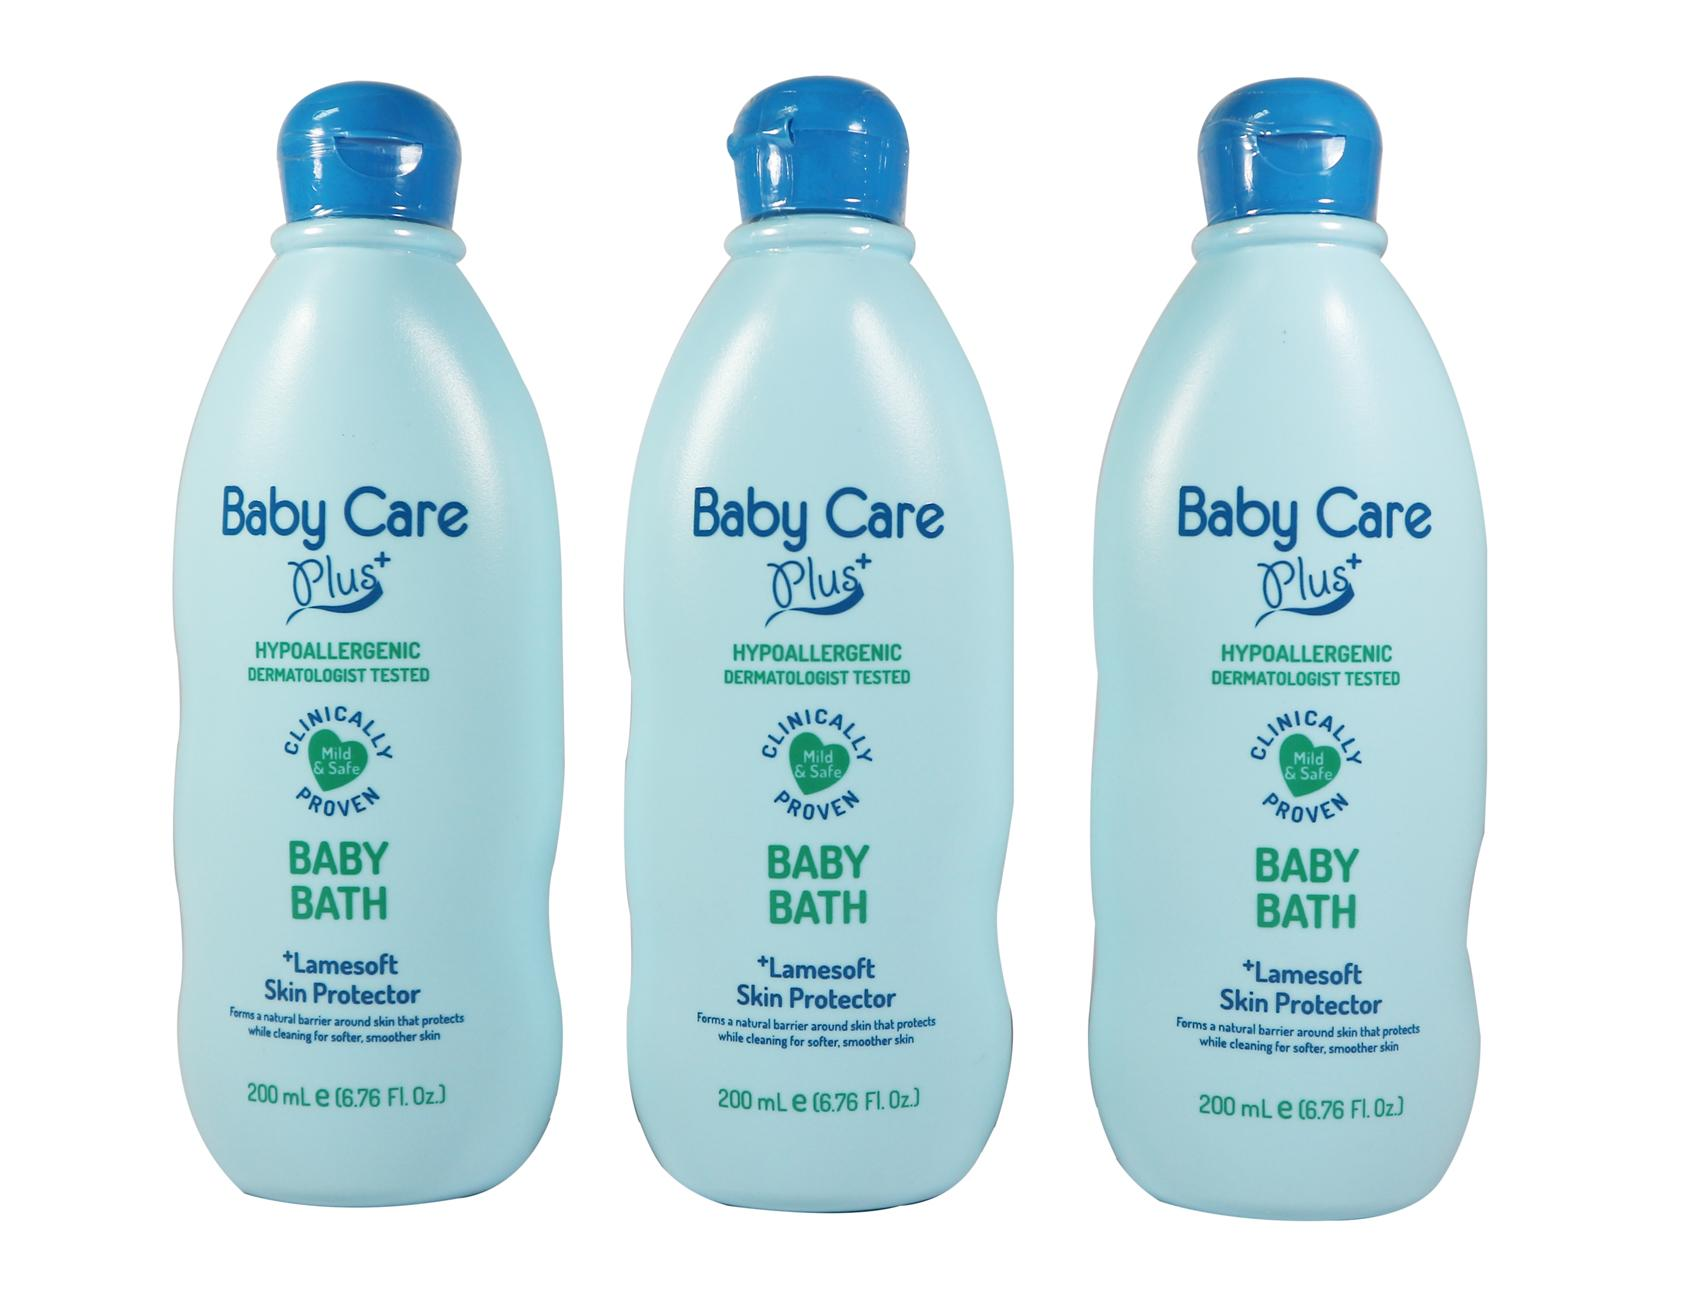 Harga Jual Zwitsal Natural Baby Bath 2 In 1 Hair Body 200 Ml Update Hairbody 200ml Care Plus Philippines Price List Moisturizing